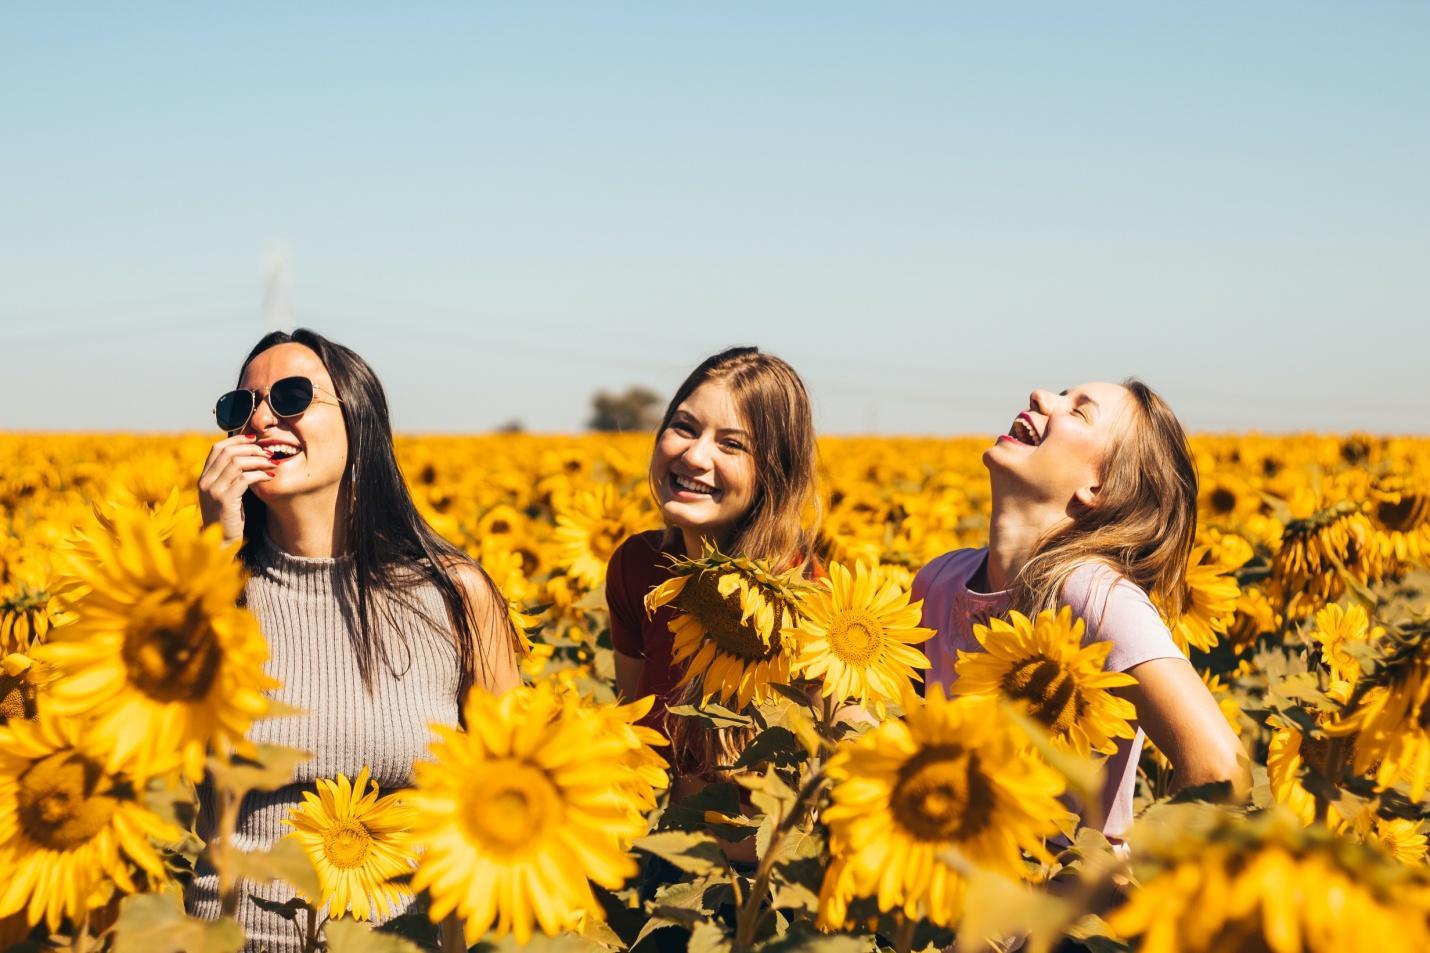 Sunglasses Trends For Women